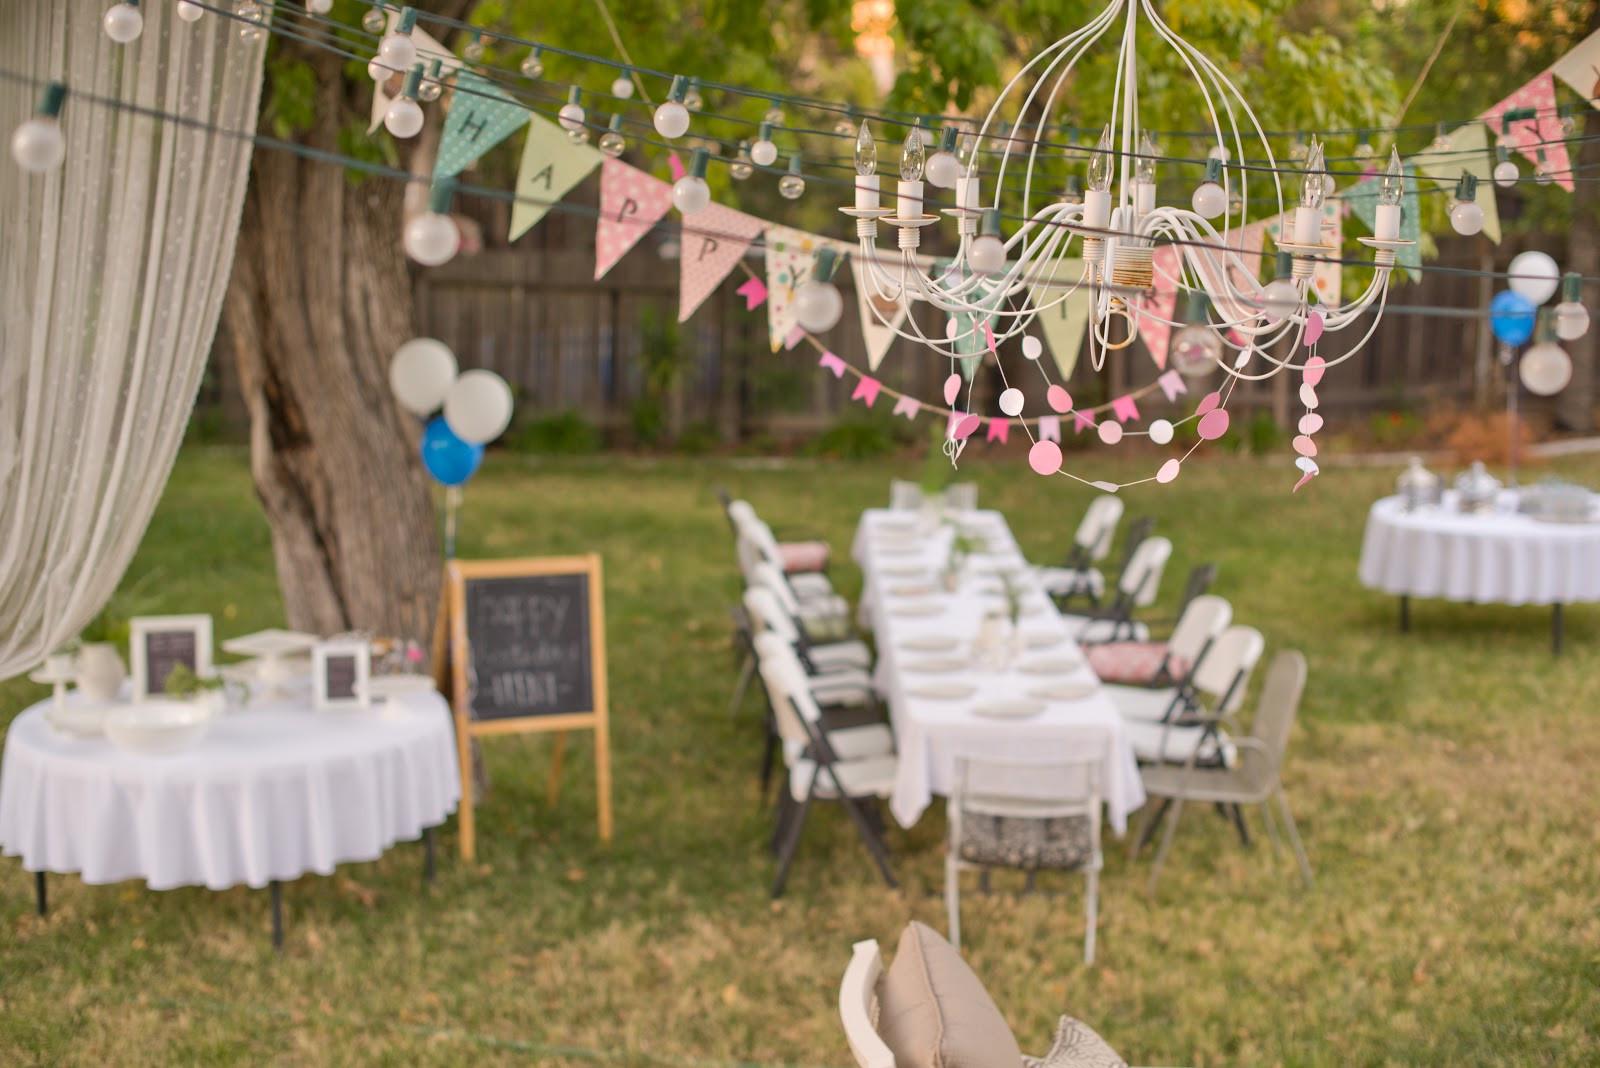 Birthday Party Ideas Backyard  Domestic Fashionista 31 Days of Creative Homemaking